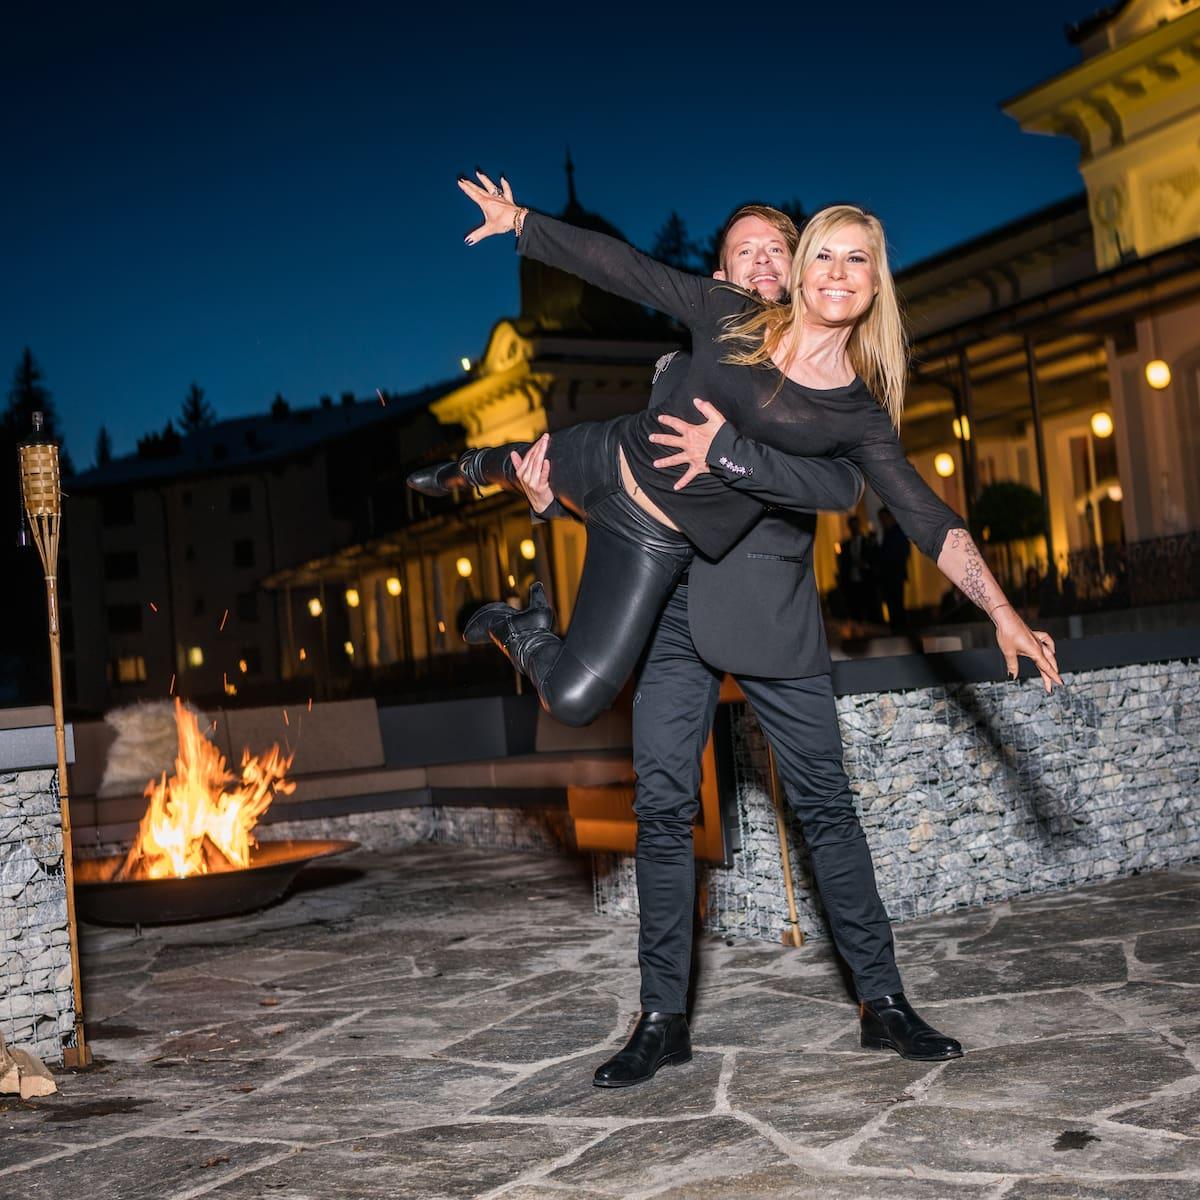 Partnersuche Schweiz Tessin - schwulentreff Mnsingen